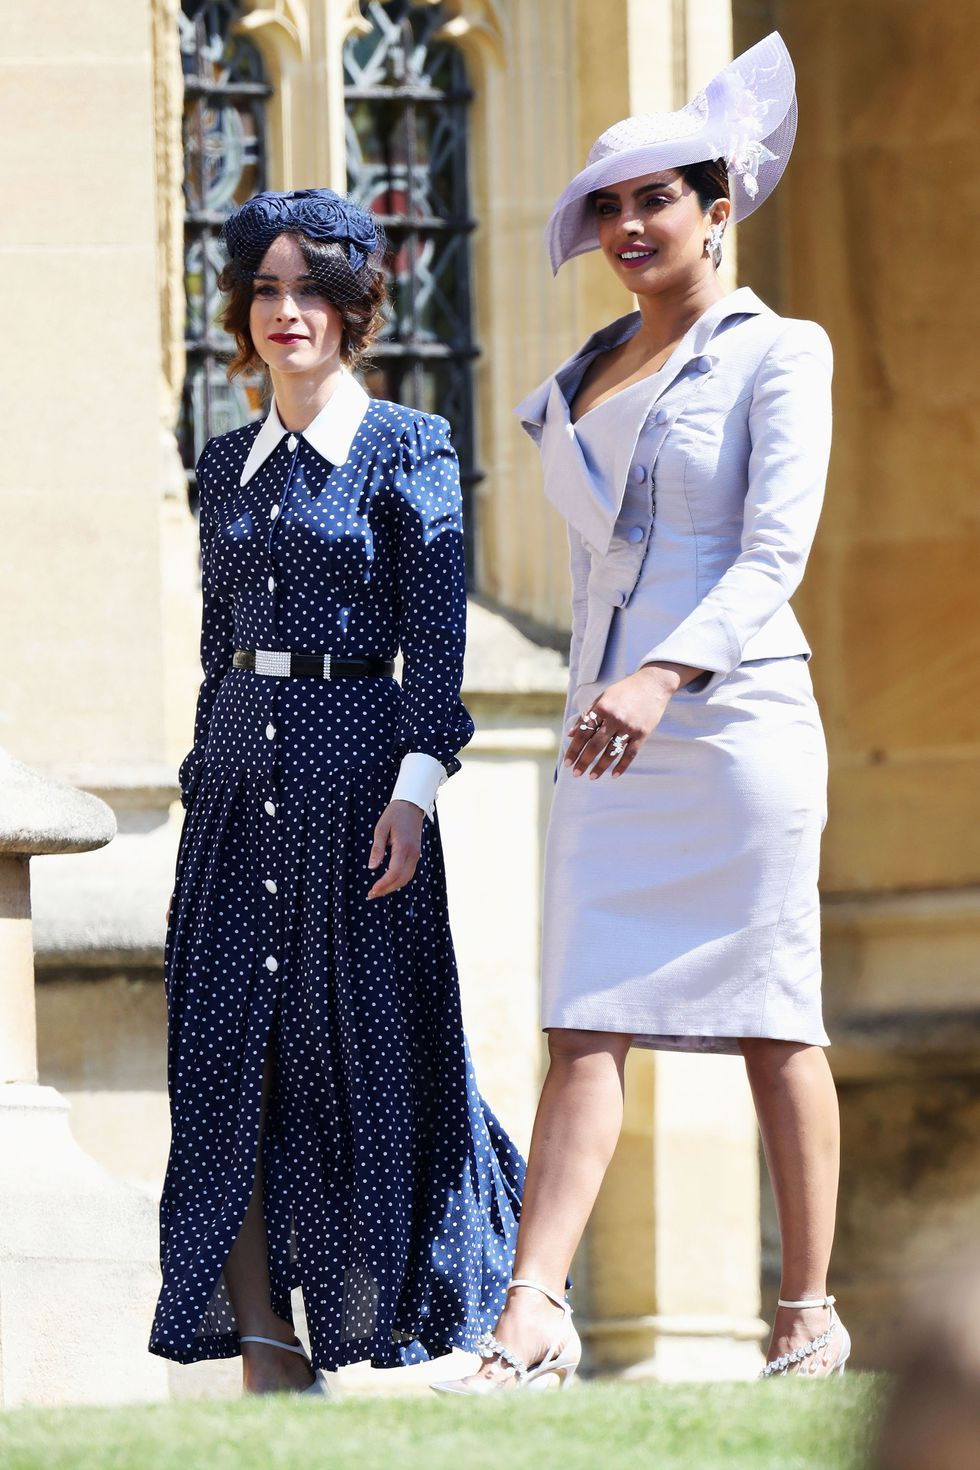 The Best Dressed Guests At The Royal Wedding Coole Kleider Prinz Harry Hochzeit Modestil